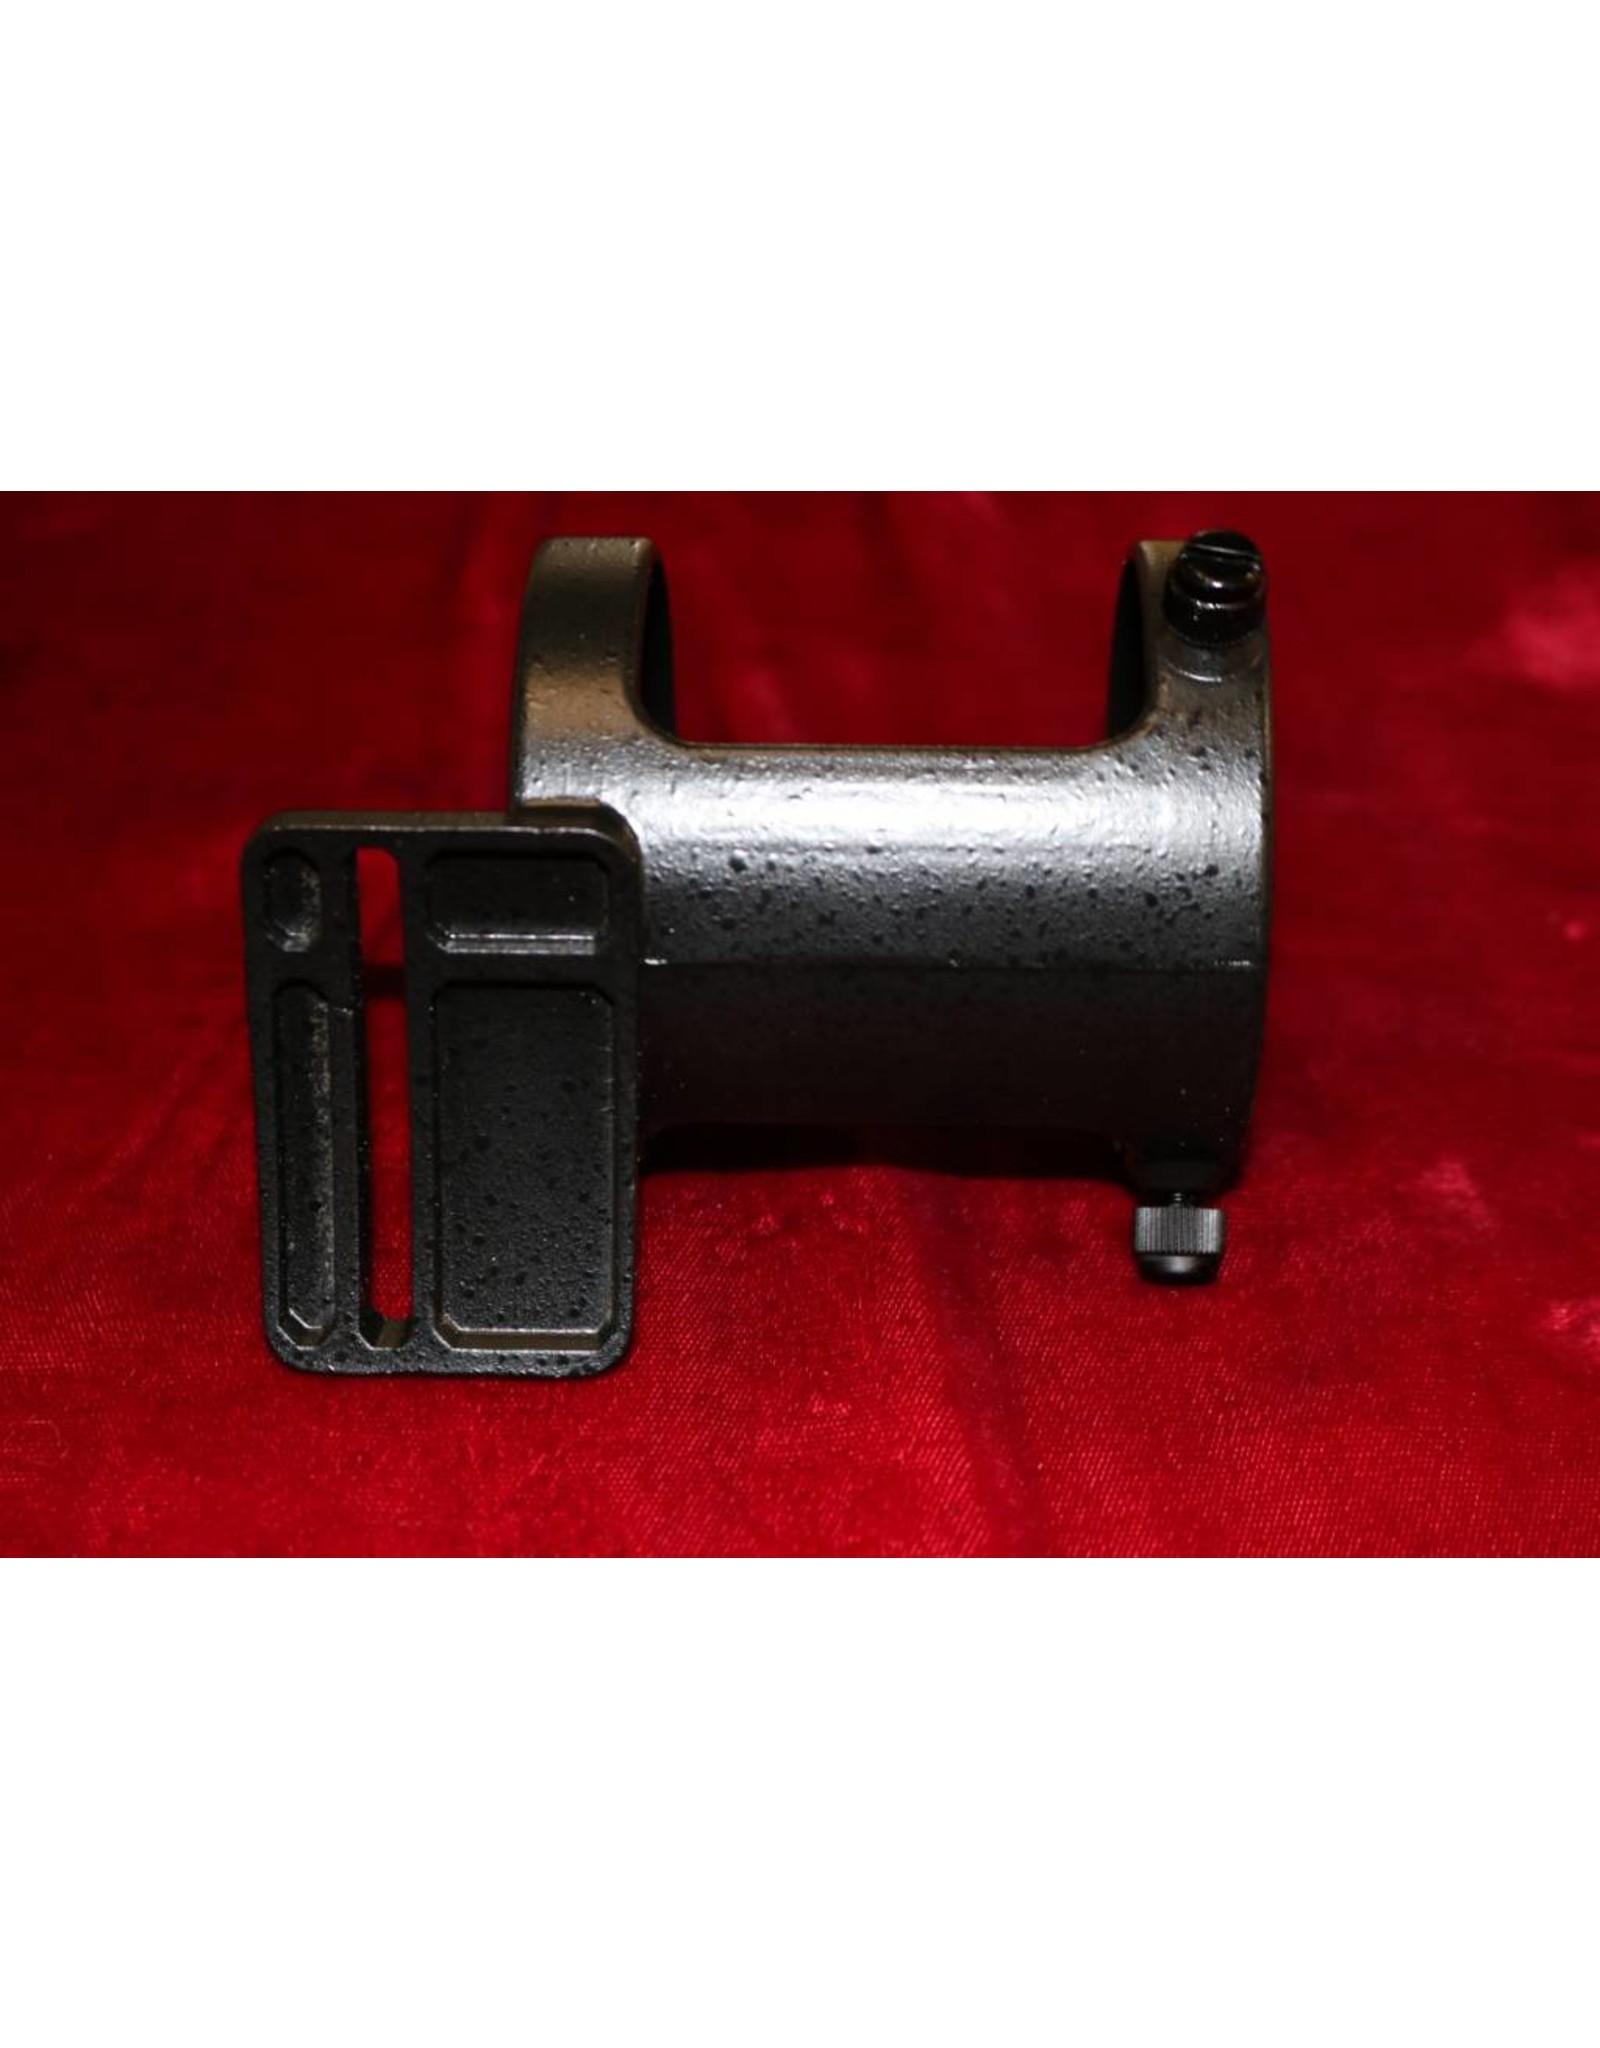 Celestron Celestron 50mm Quick Release Finder Bracket #51149-A